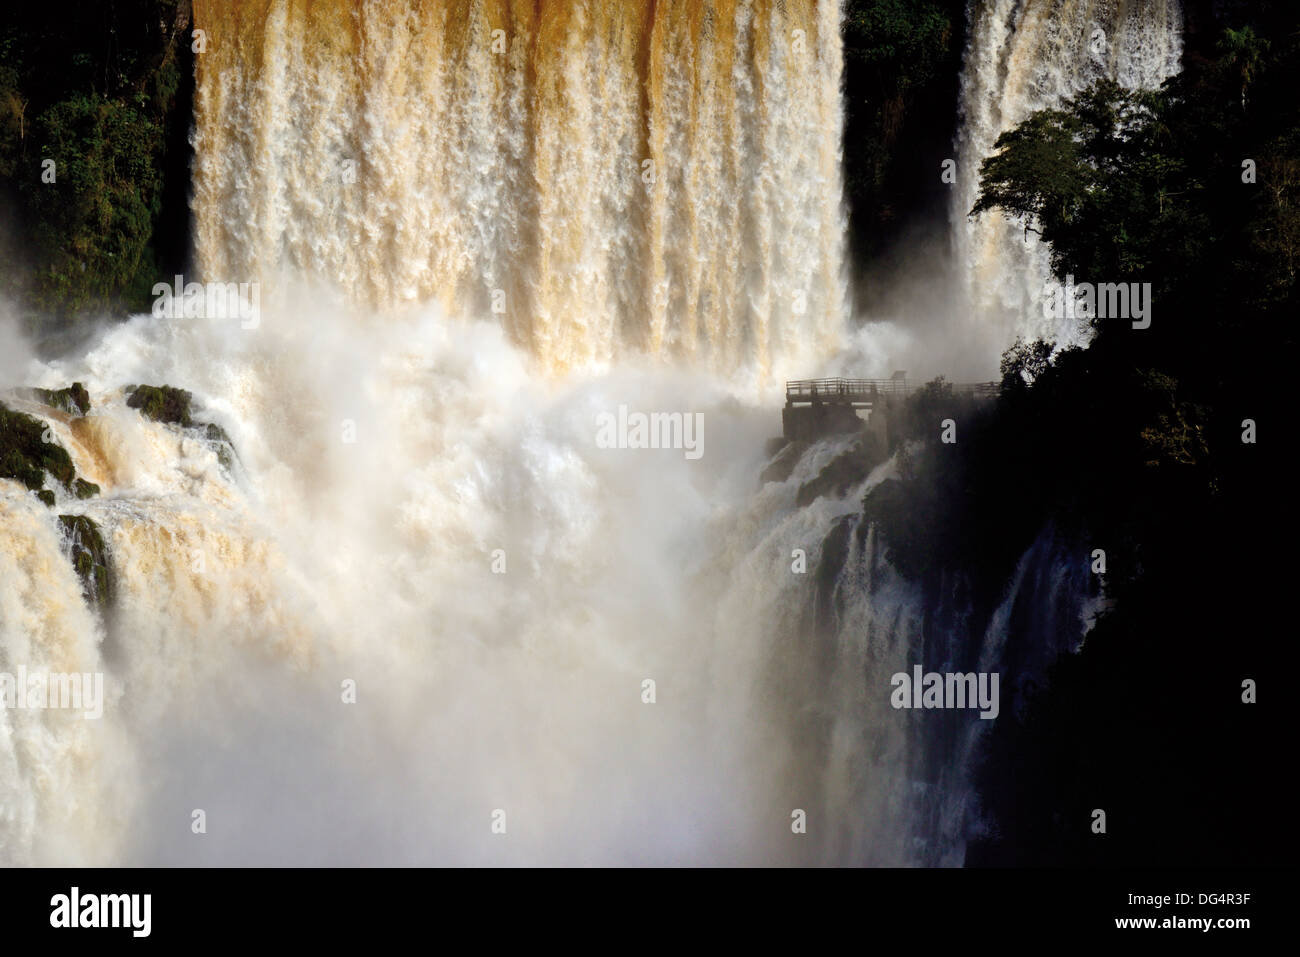 Brazil, Iguassu National Park: Spot of the Iguassu Falls with record water levels - Stock Image